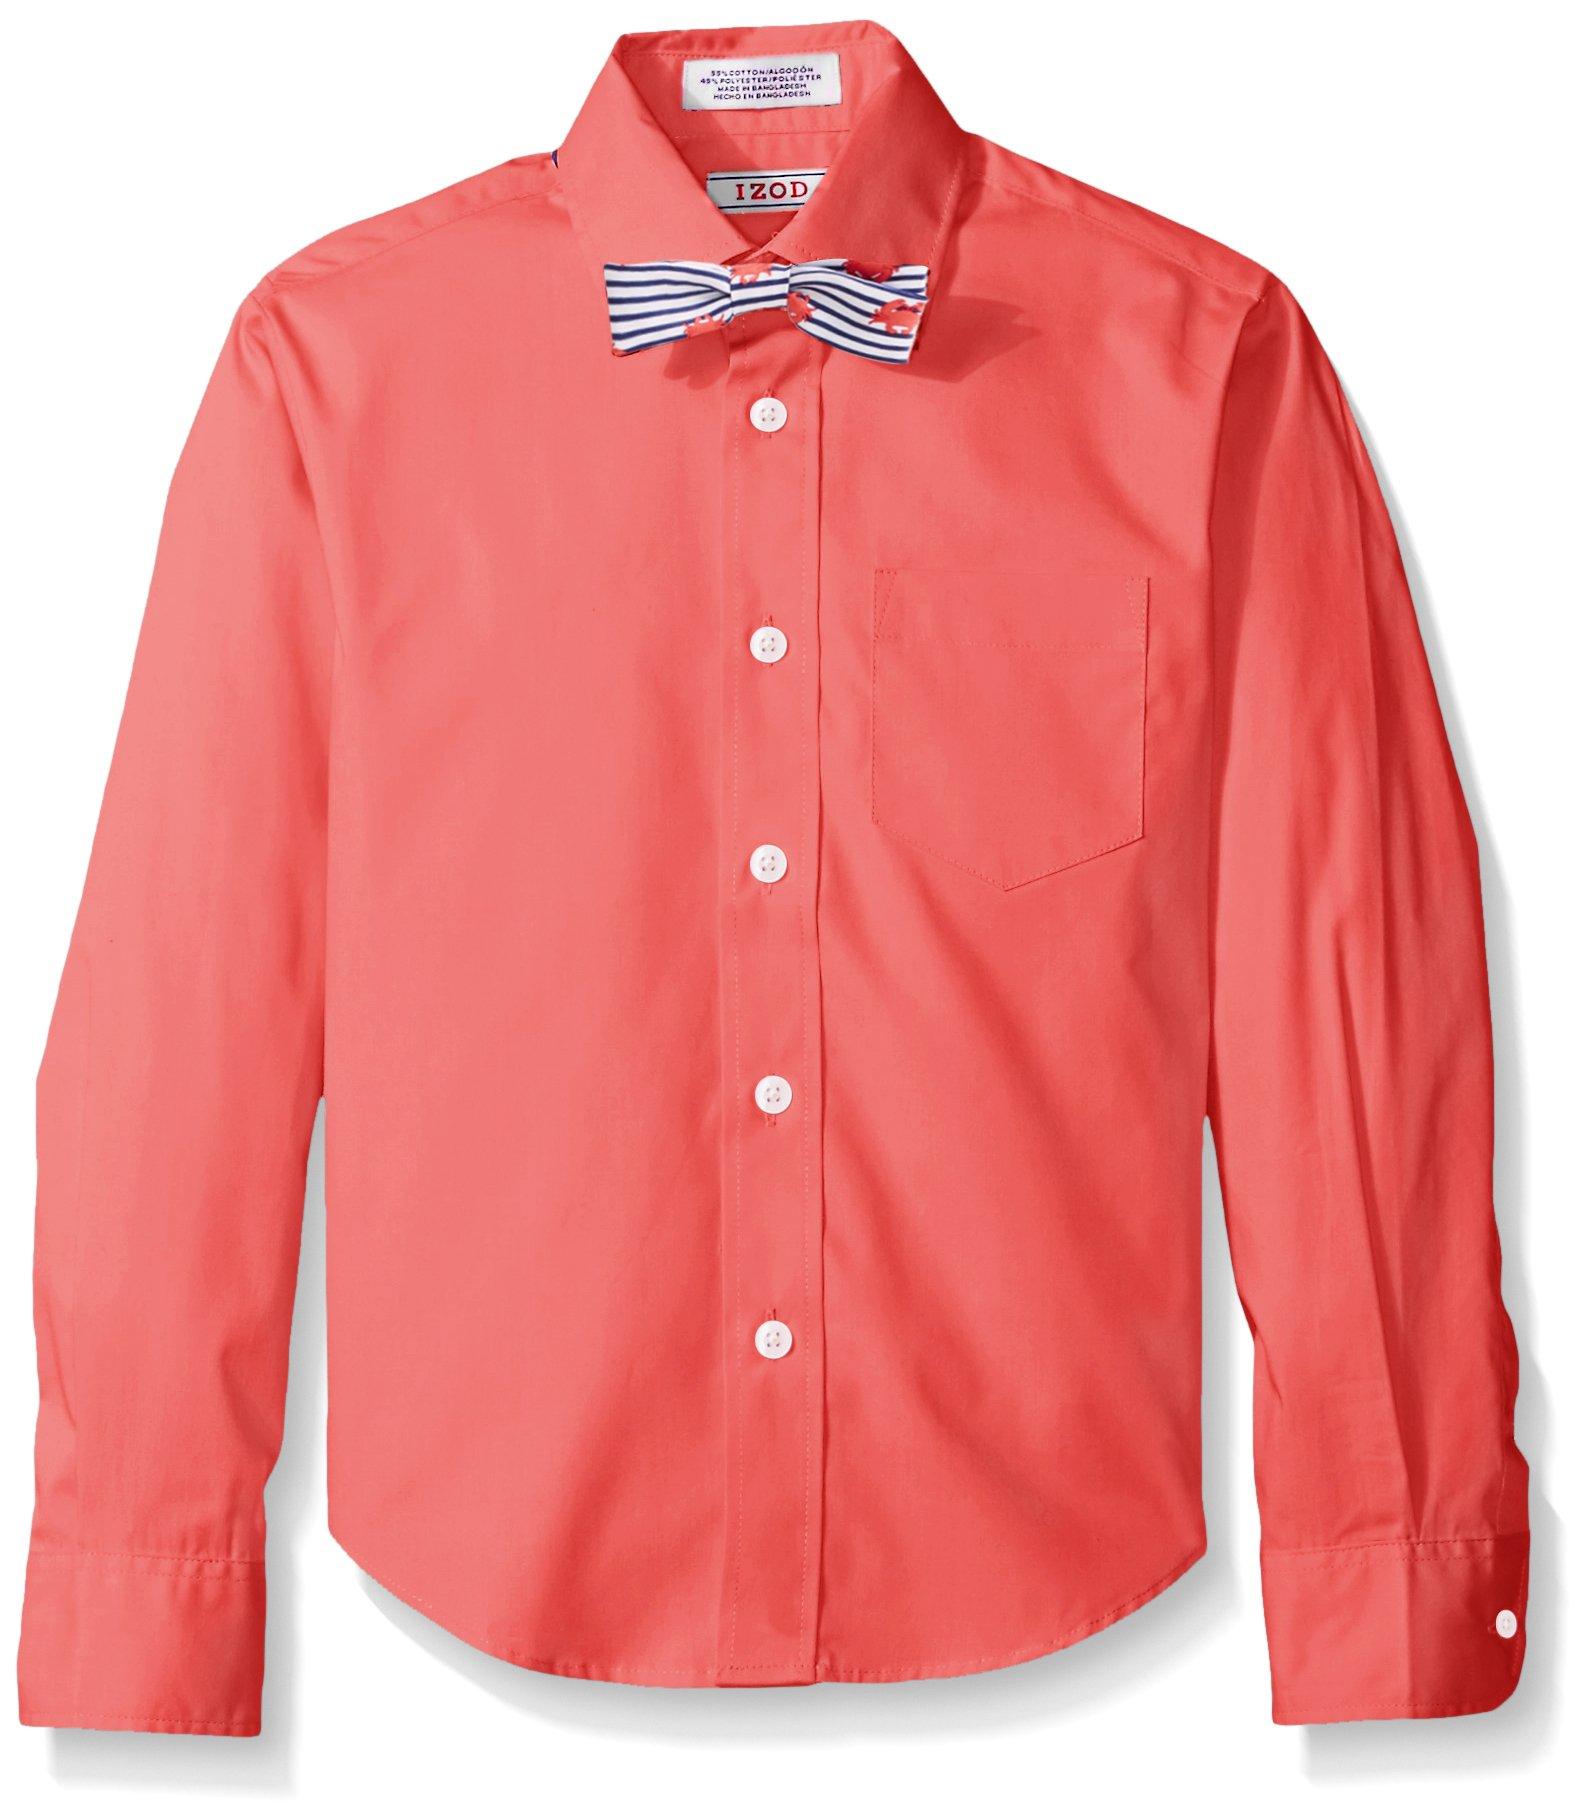 IZOD Kids Big Boys' L/s Solid Shirt and Bowtie Set, Claret Red, 08 Regular